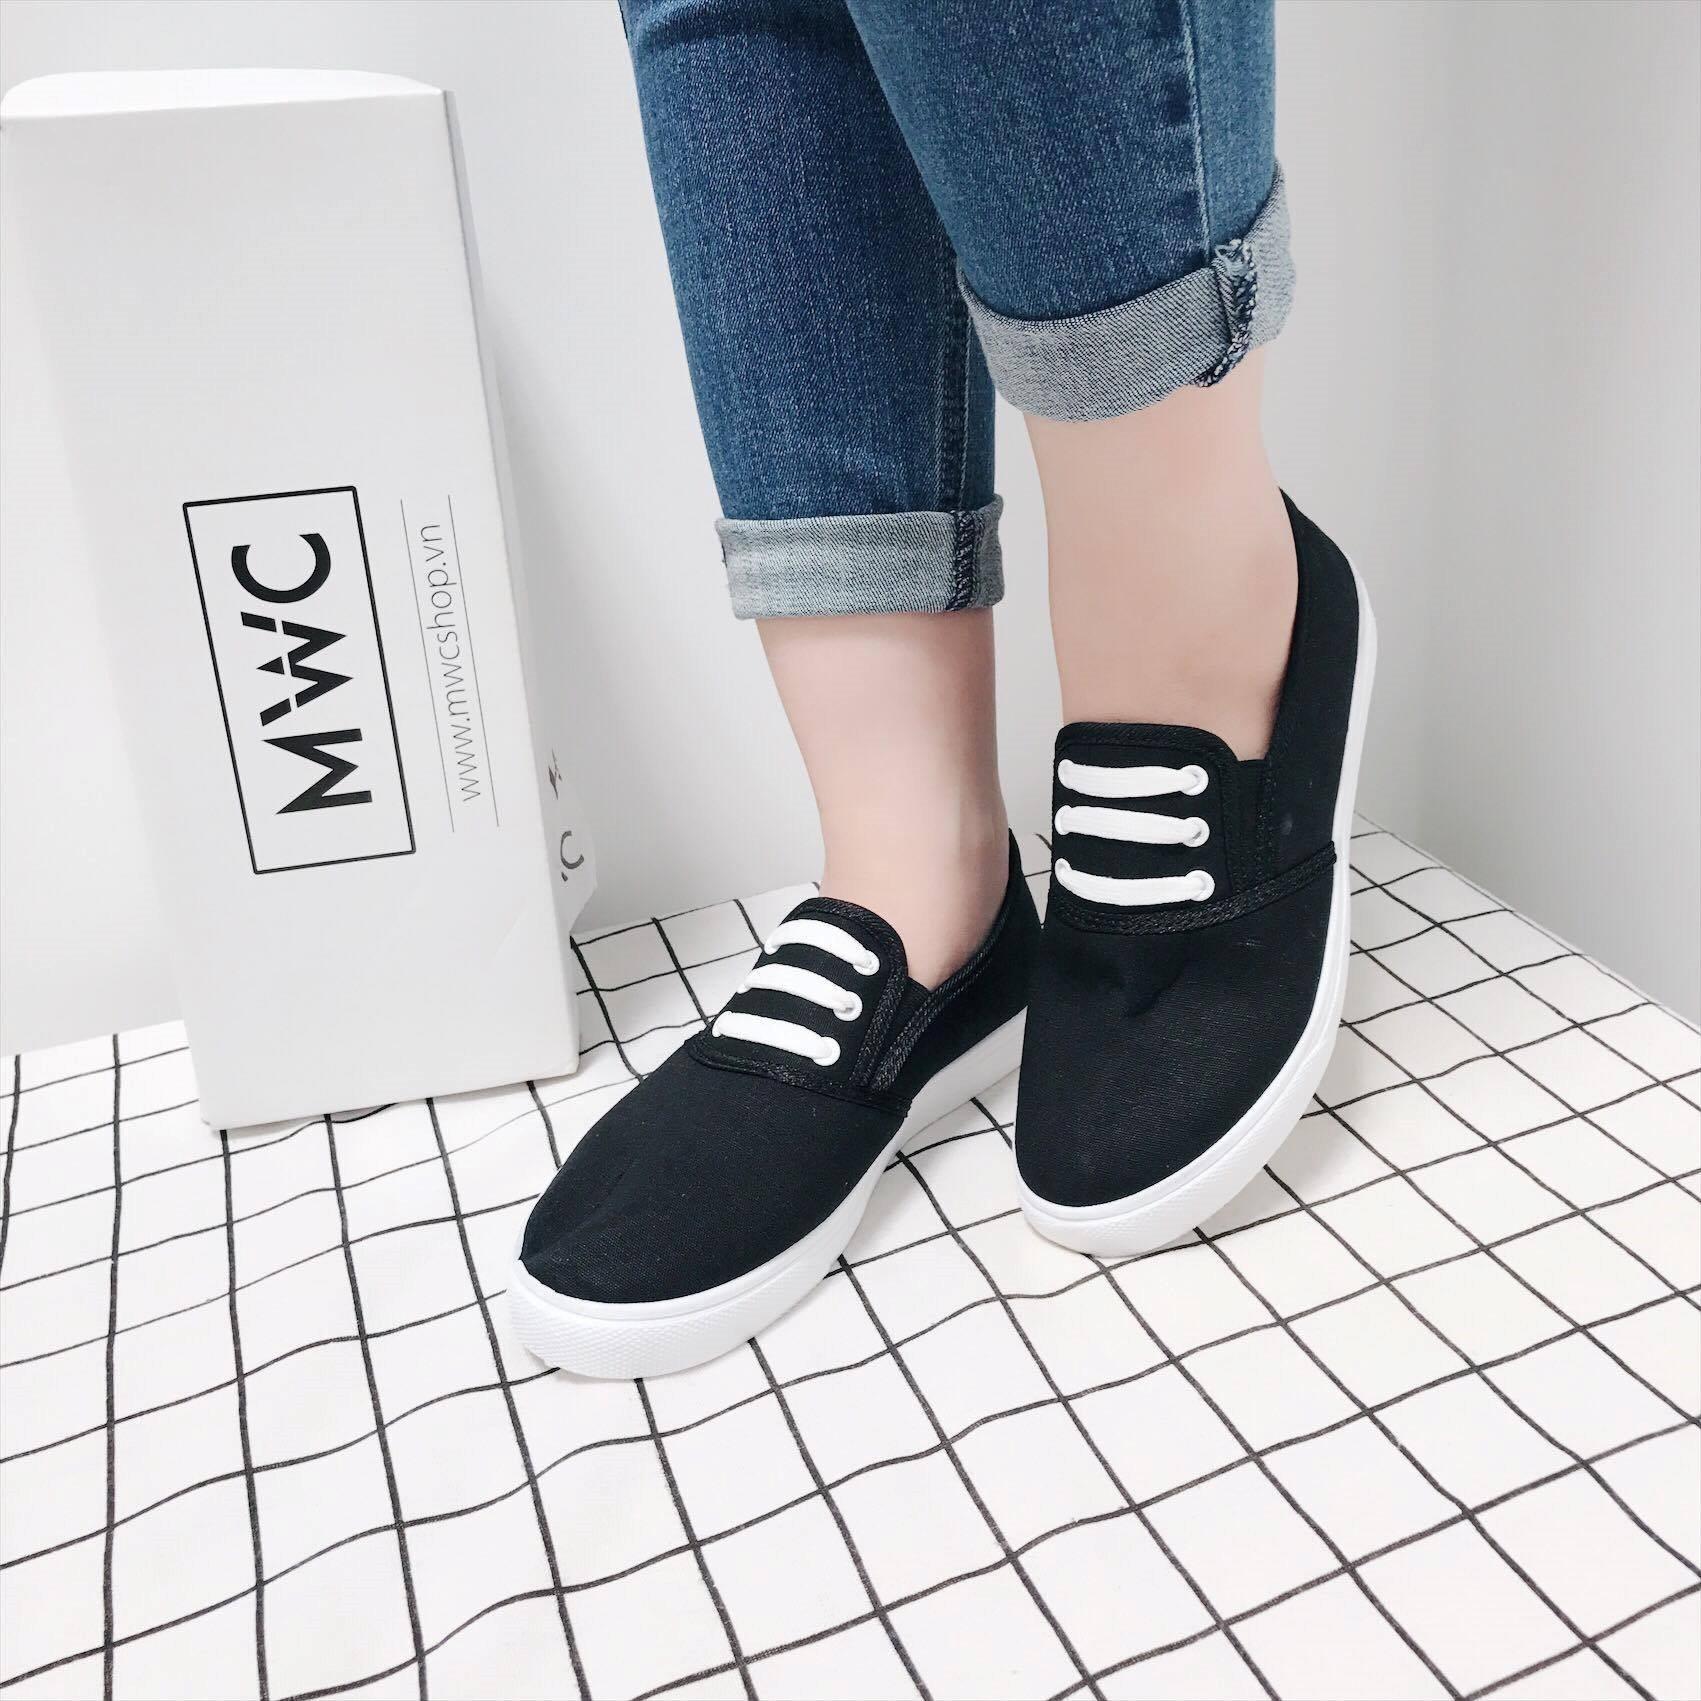 .Giày Slipon nữ MWC NUSL- 1514 - ĐEN